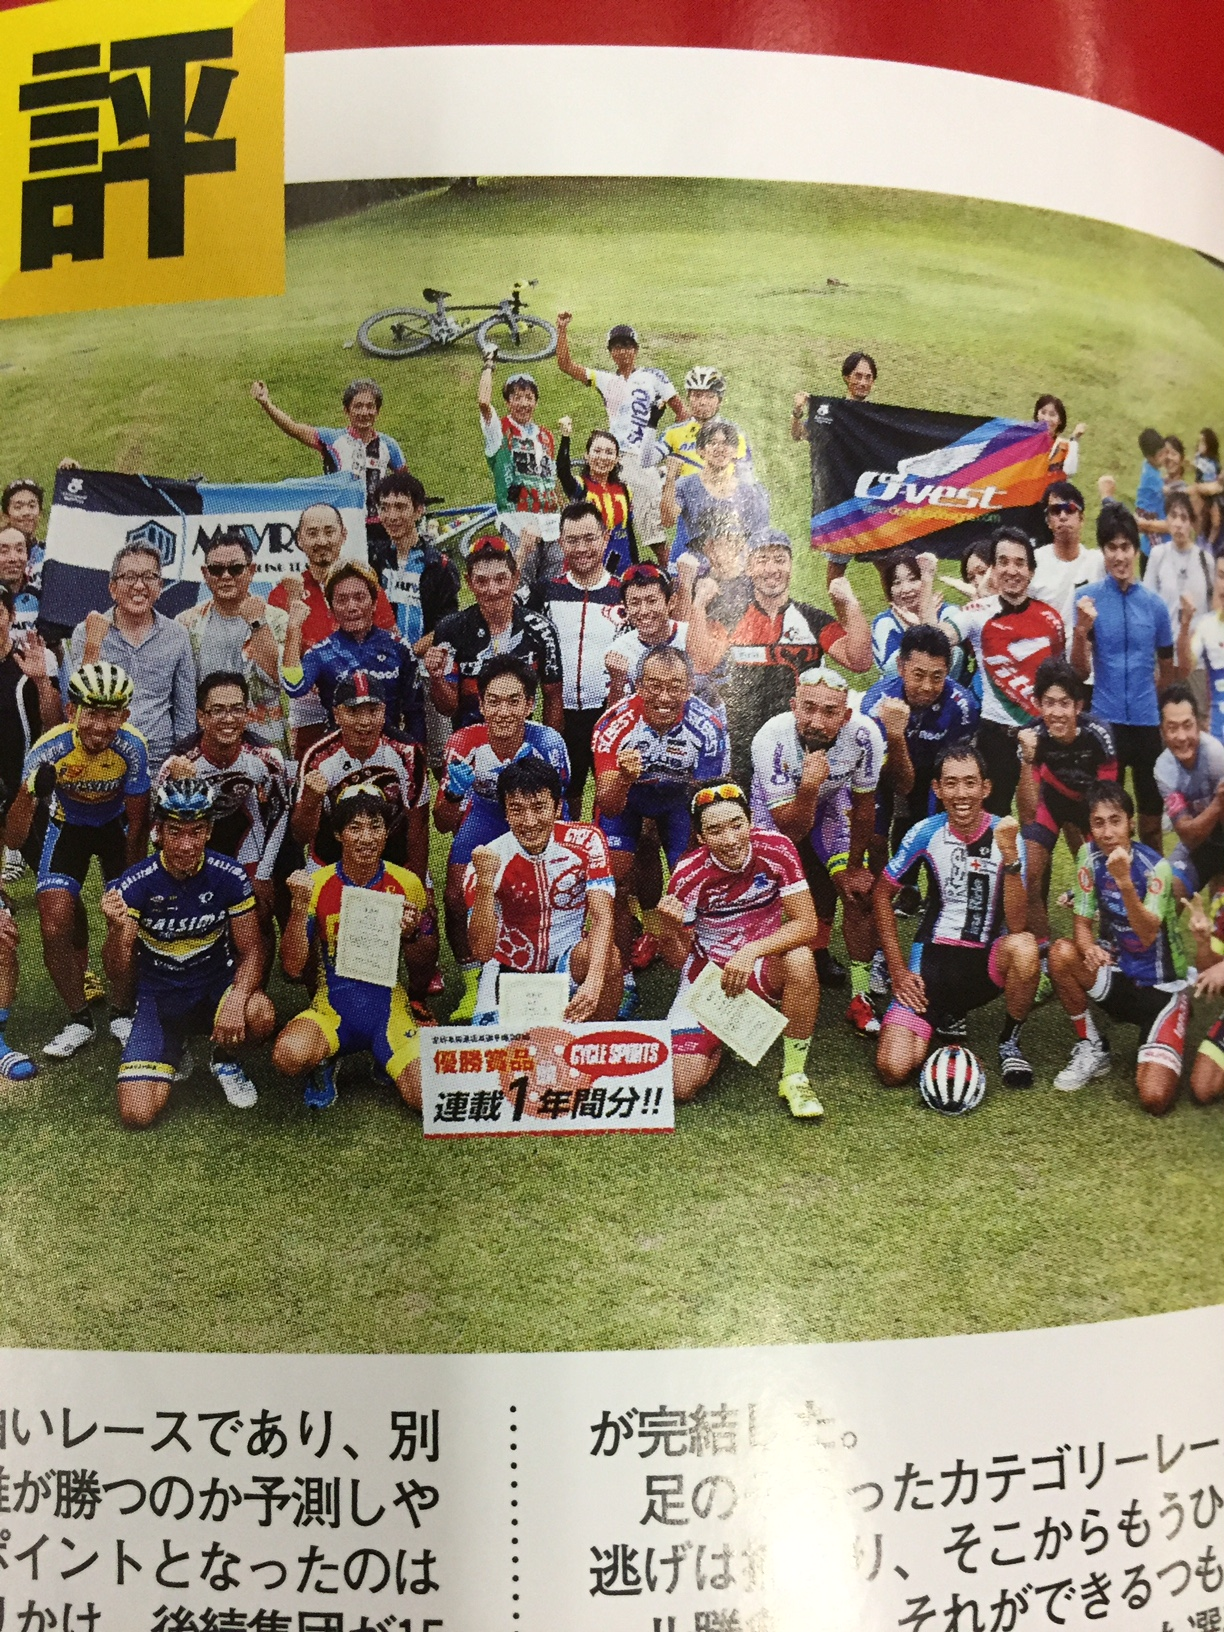 CycleSport-12-6.jpg